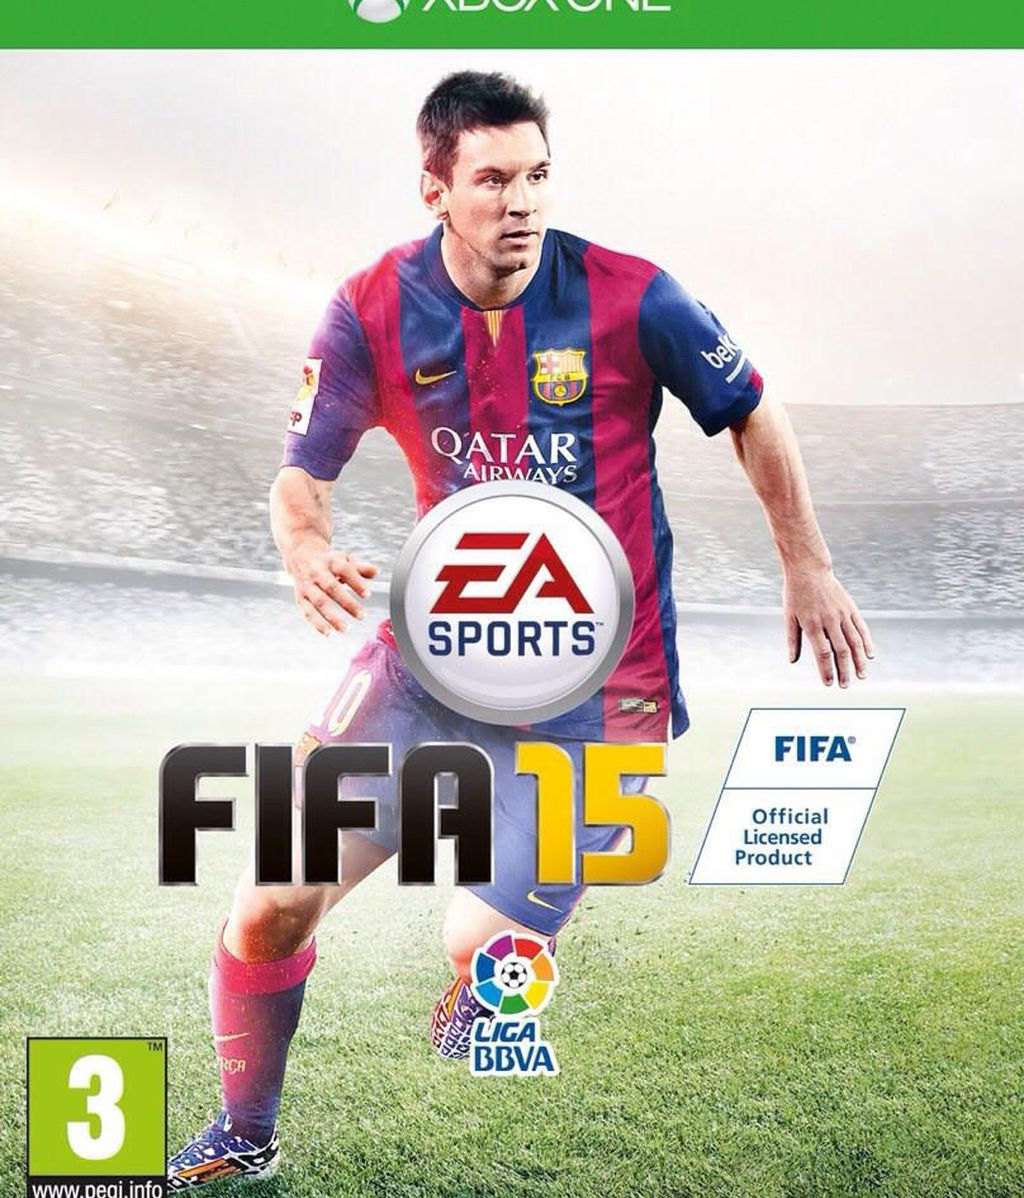 FIFA 15, Messi, videojuegos